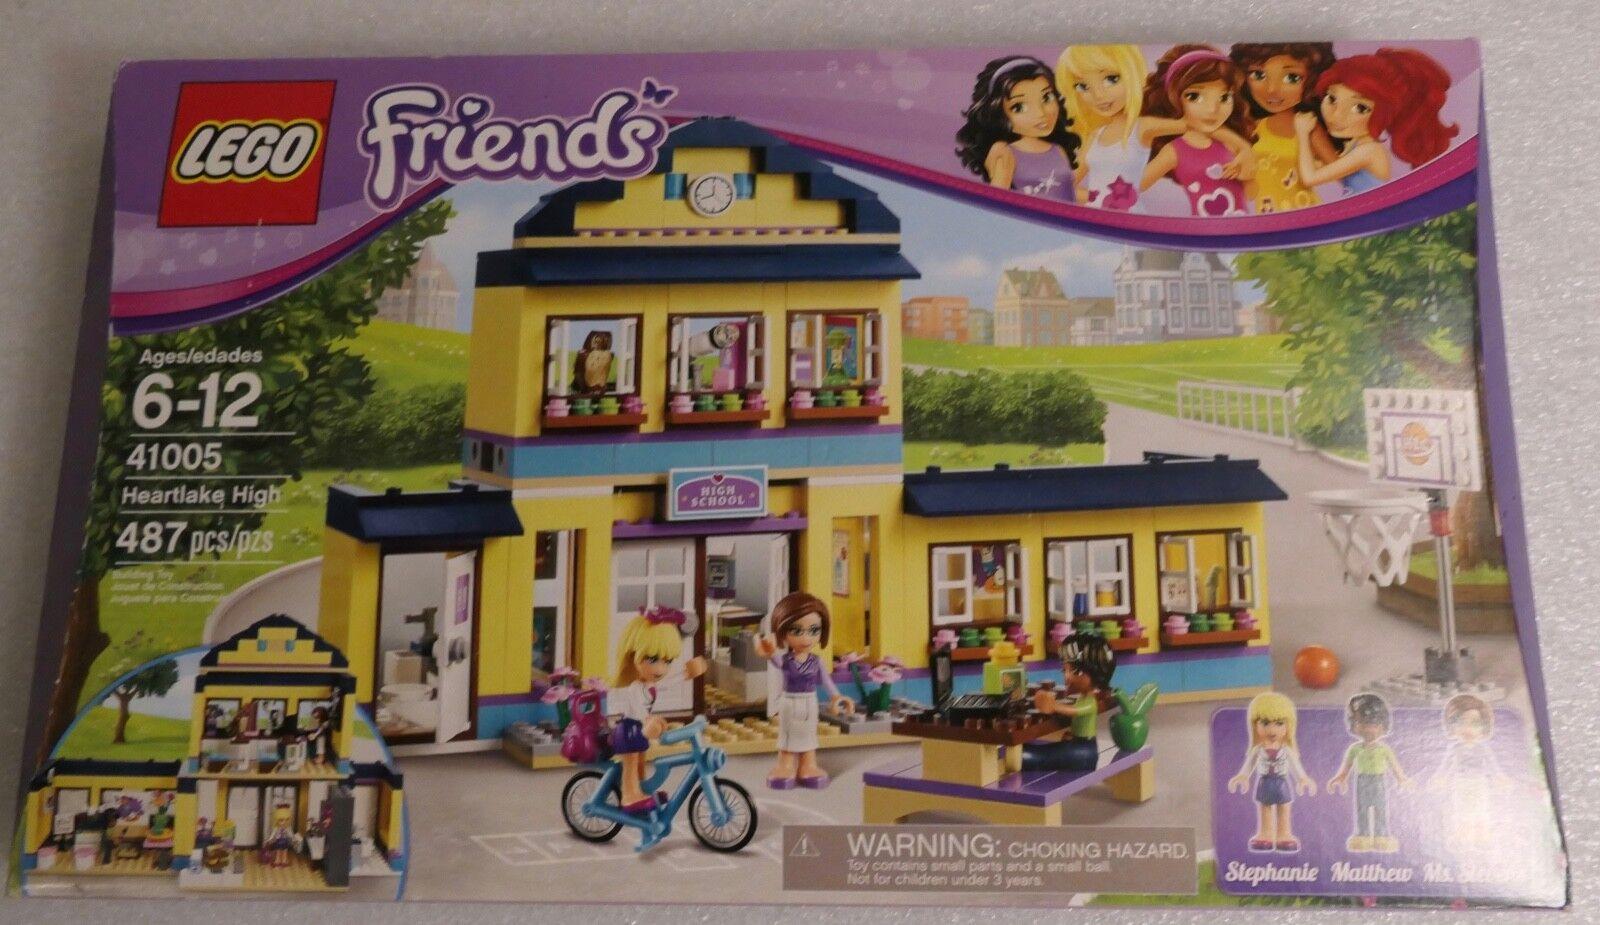 Lego Friends 41005 Heartlake High Oqhdbn6529 Lego Complete Sets